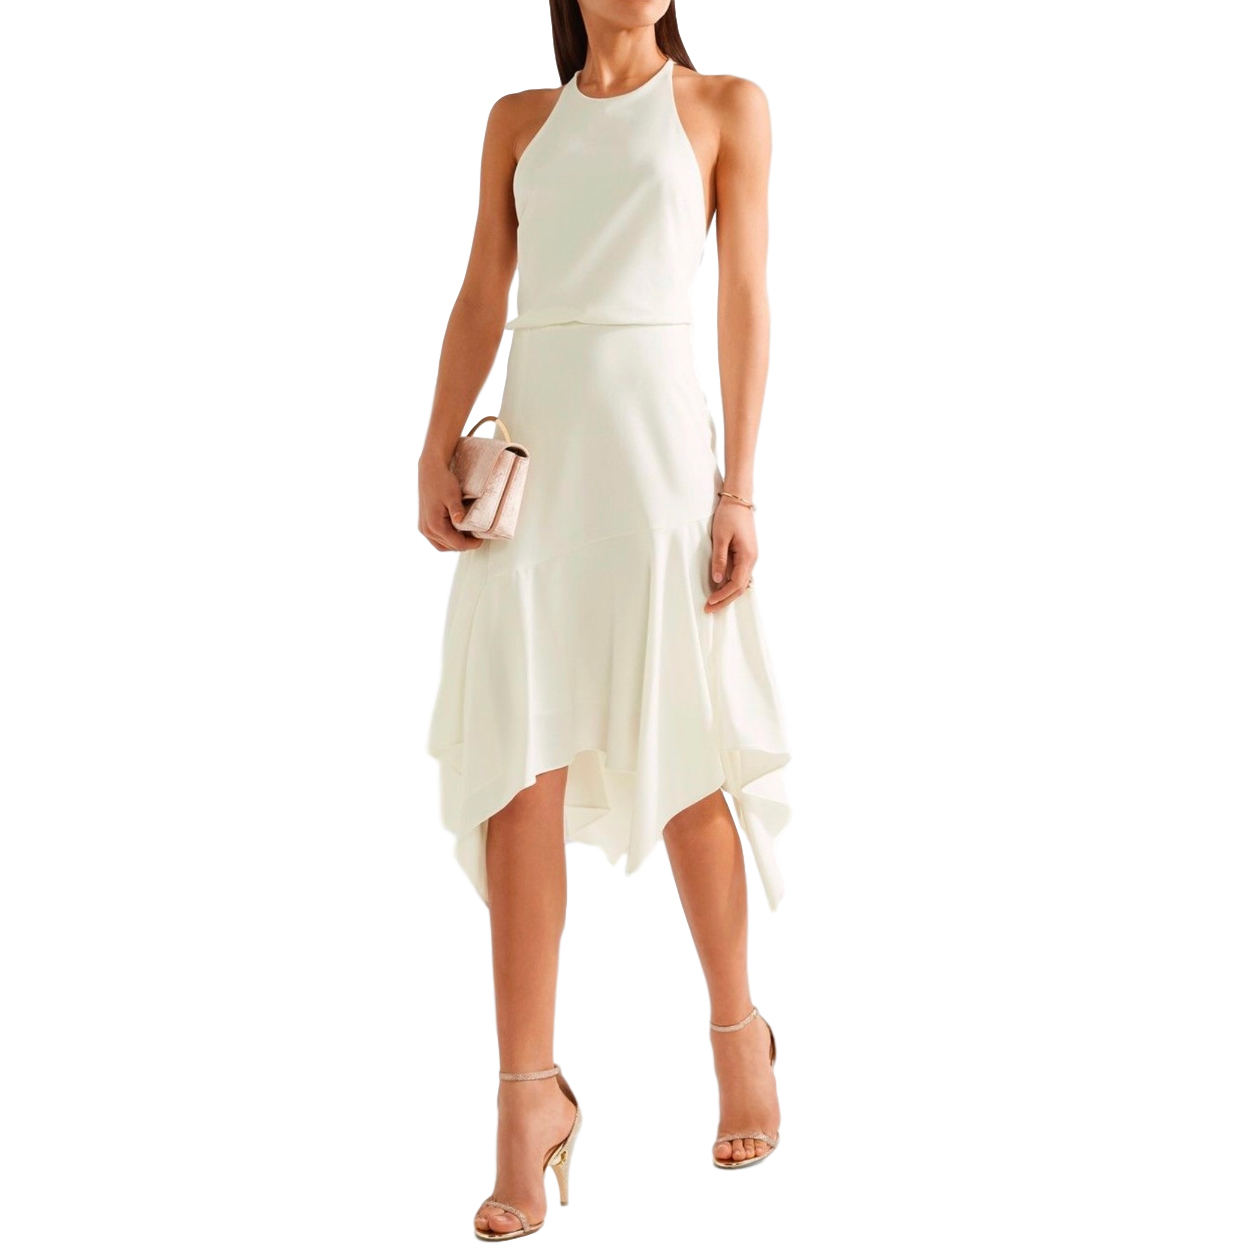 Halston Heritage Chalk Asymmetric Dress